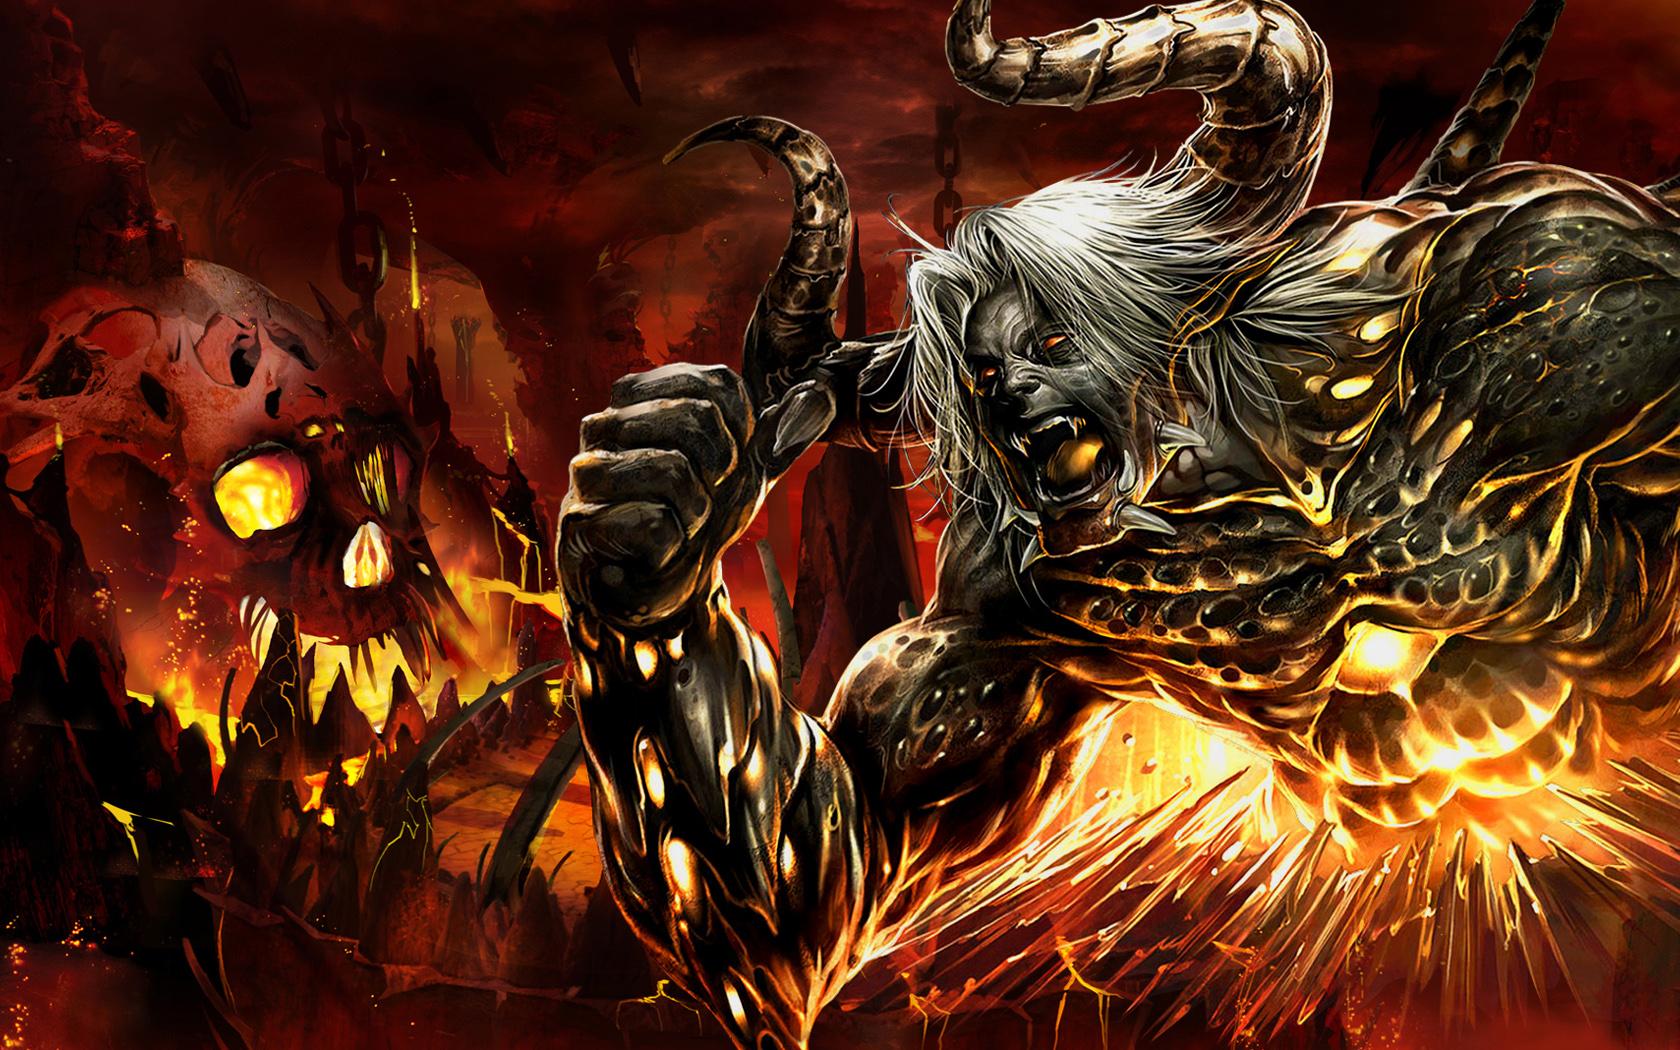 Cool Bull Devil Wallpaper Android 2764 Wallpaper High Resolution 1680x1050